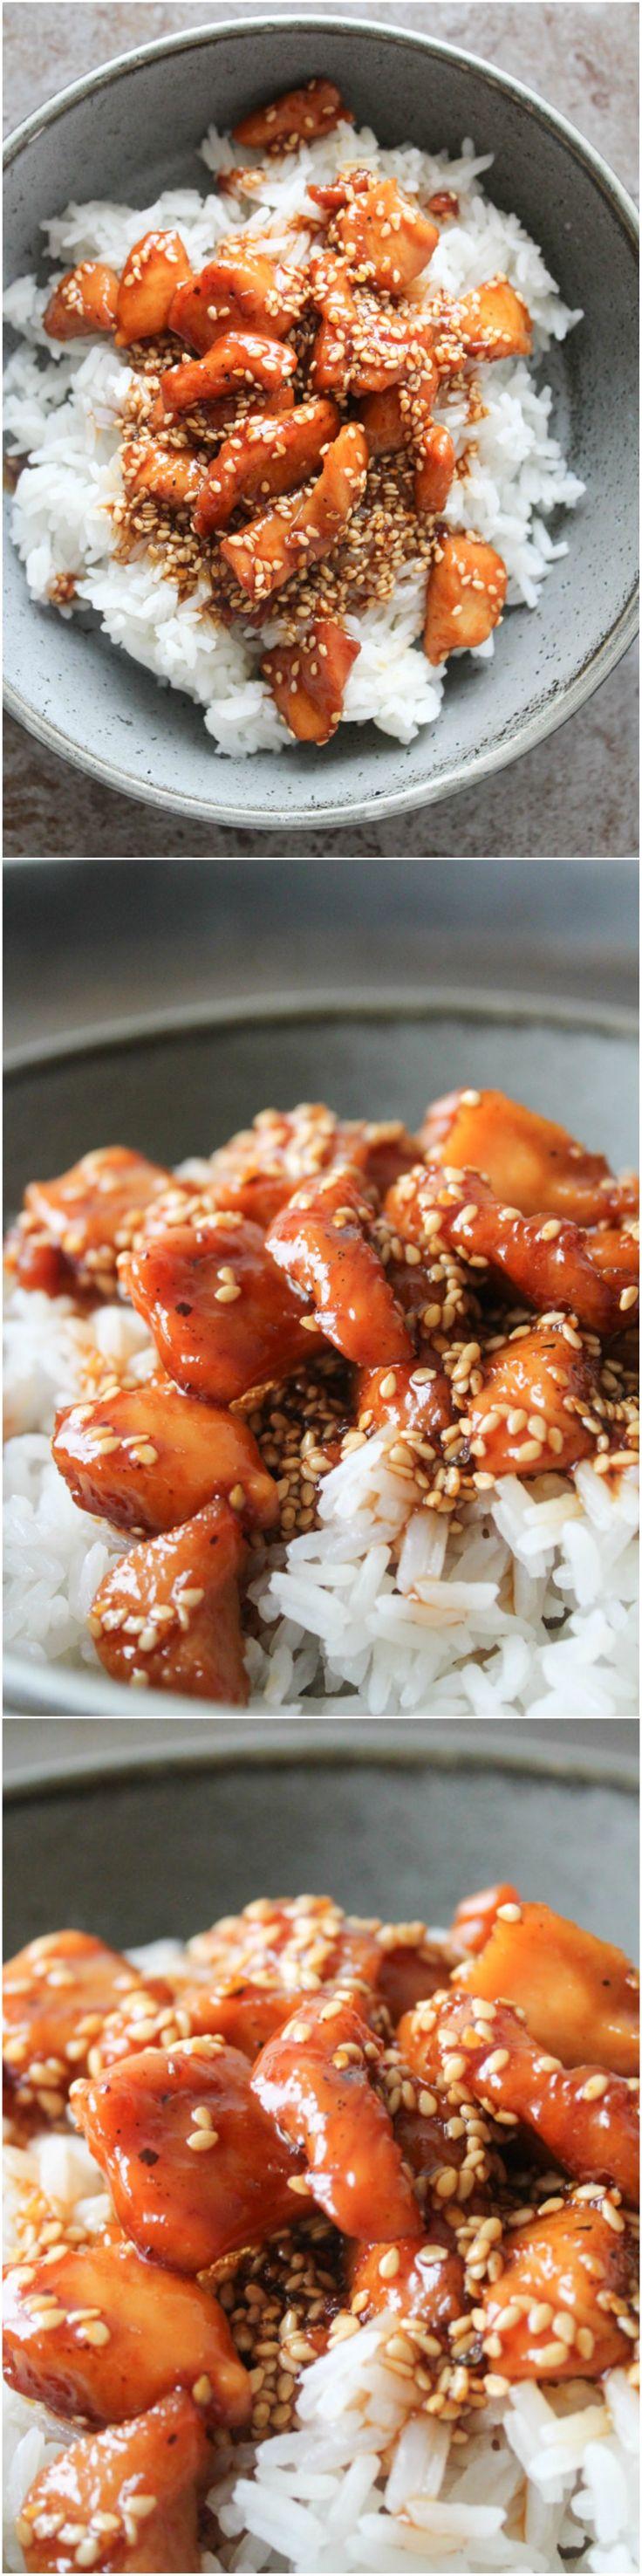 Orange and honey sesame chicken